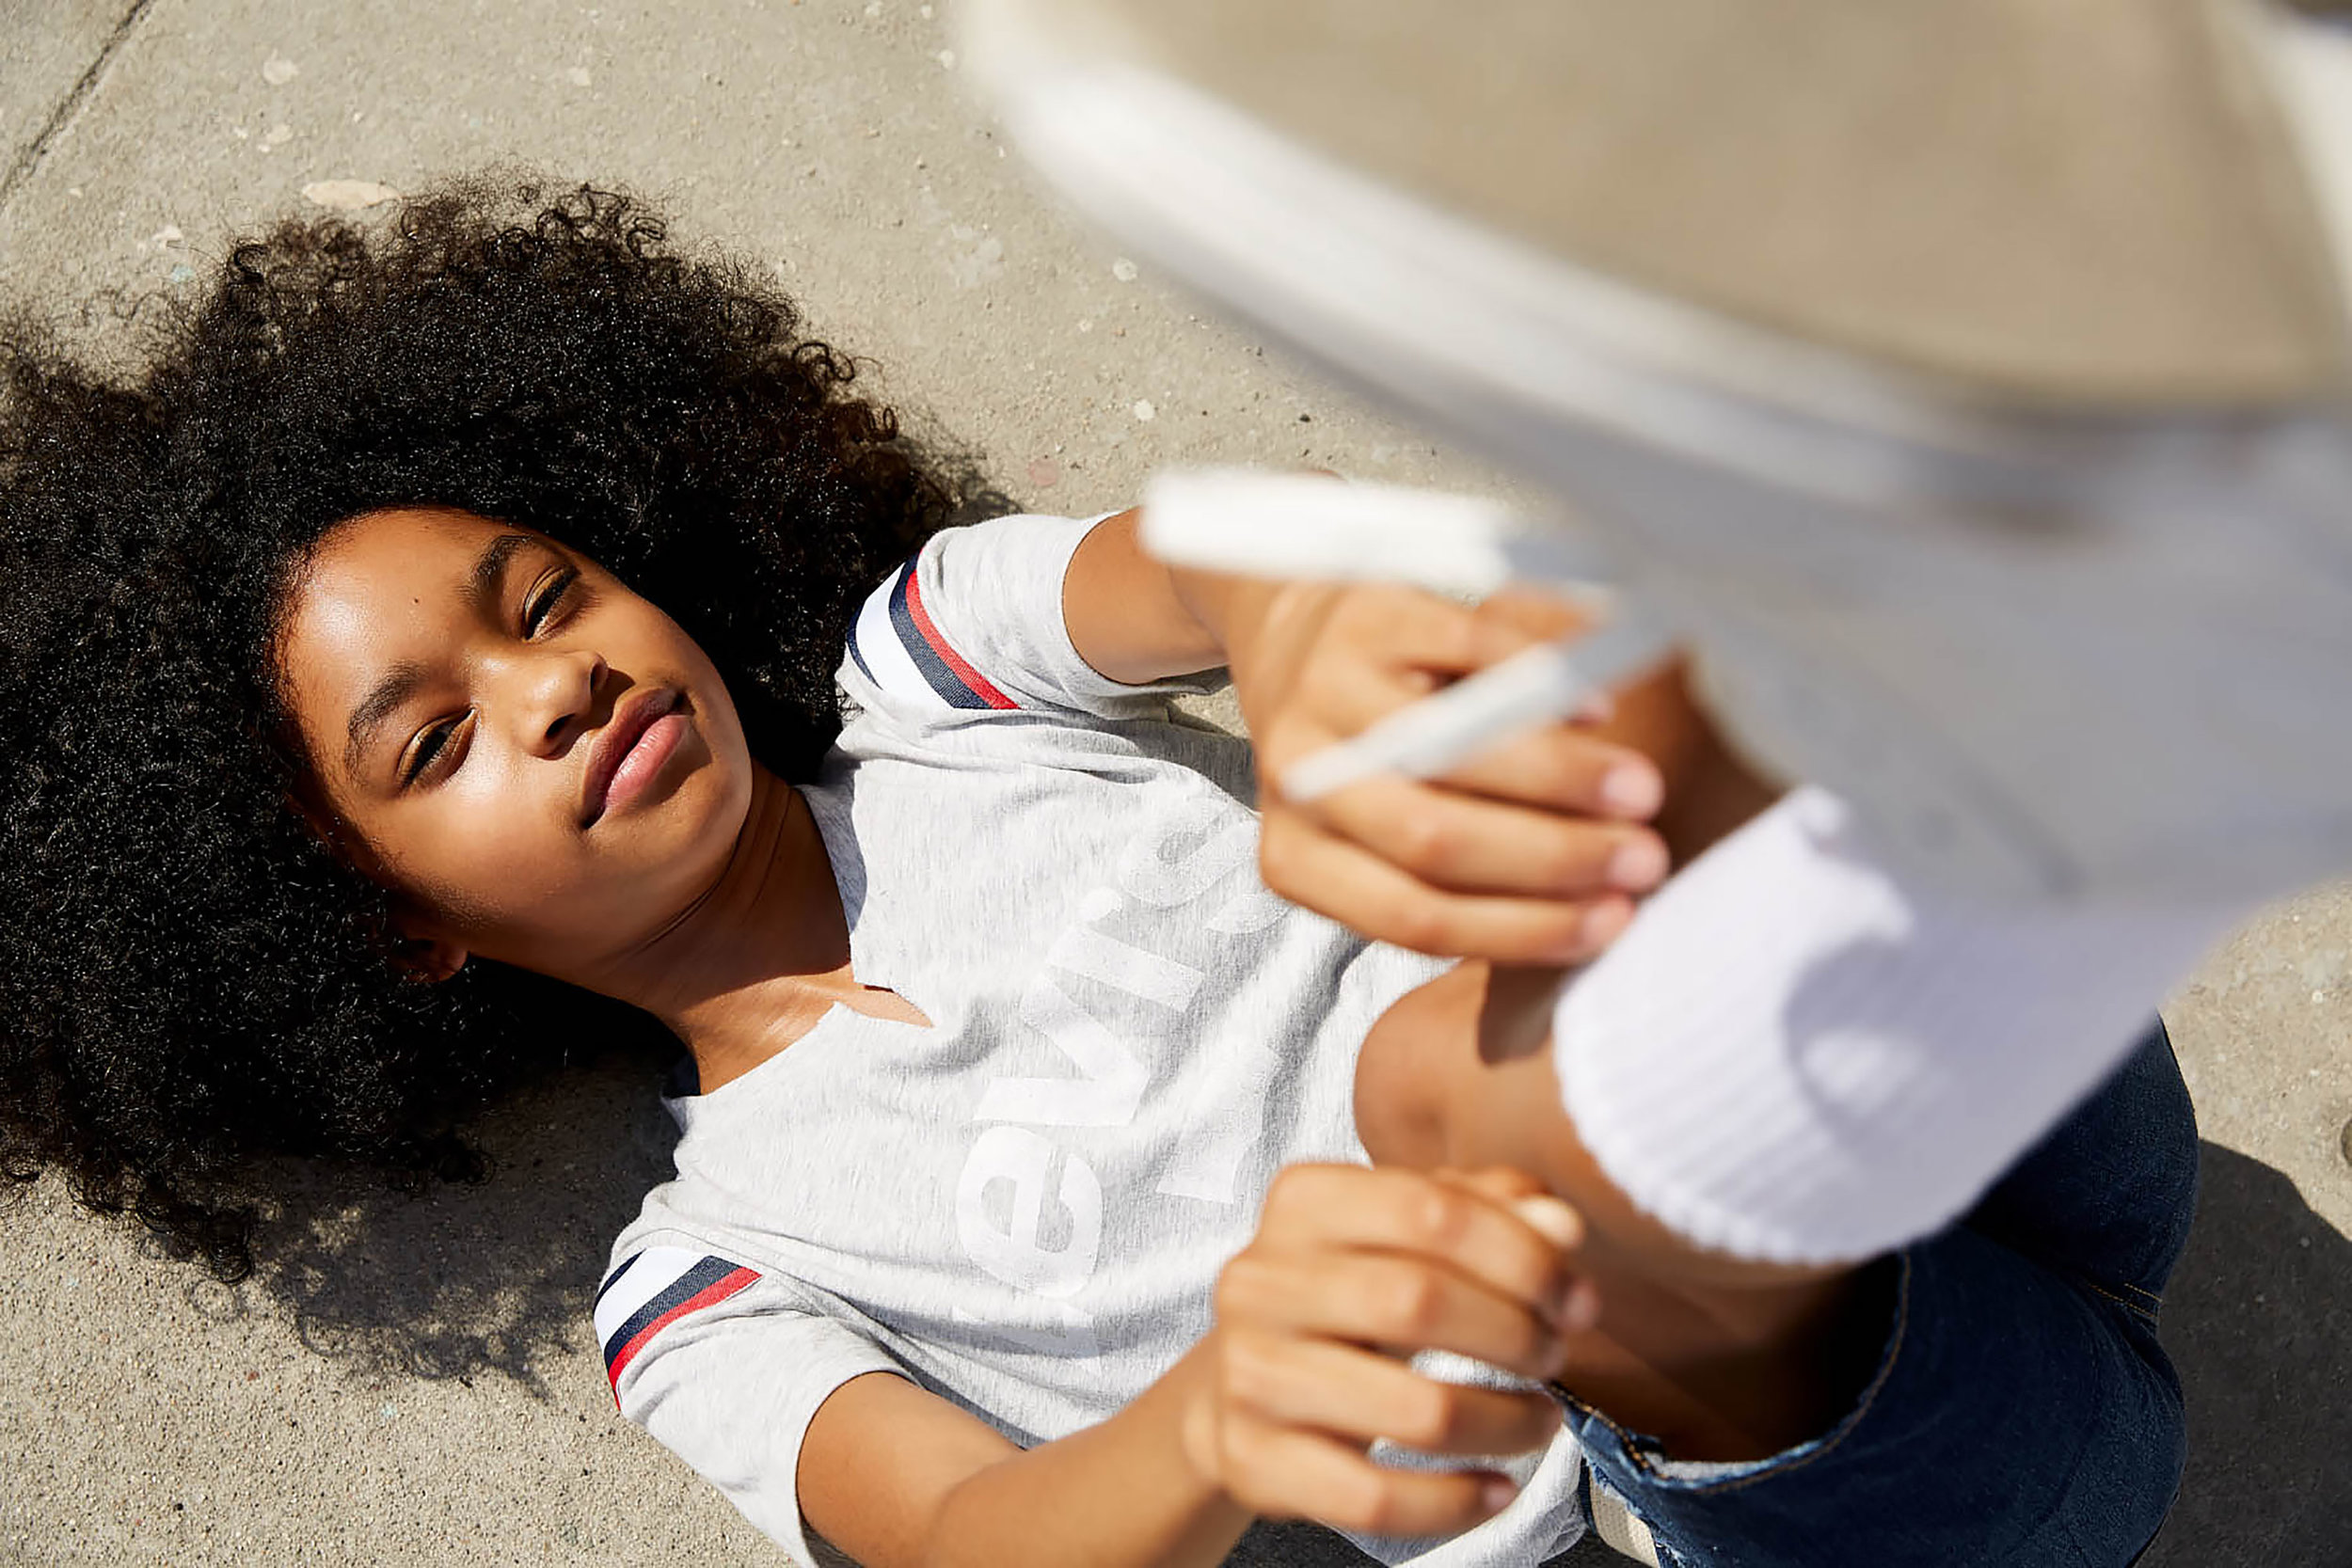 17_19_H1_Kids_Haddad_BermudaShort_10Yyr_G_0220.jpg